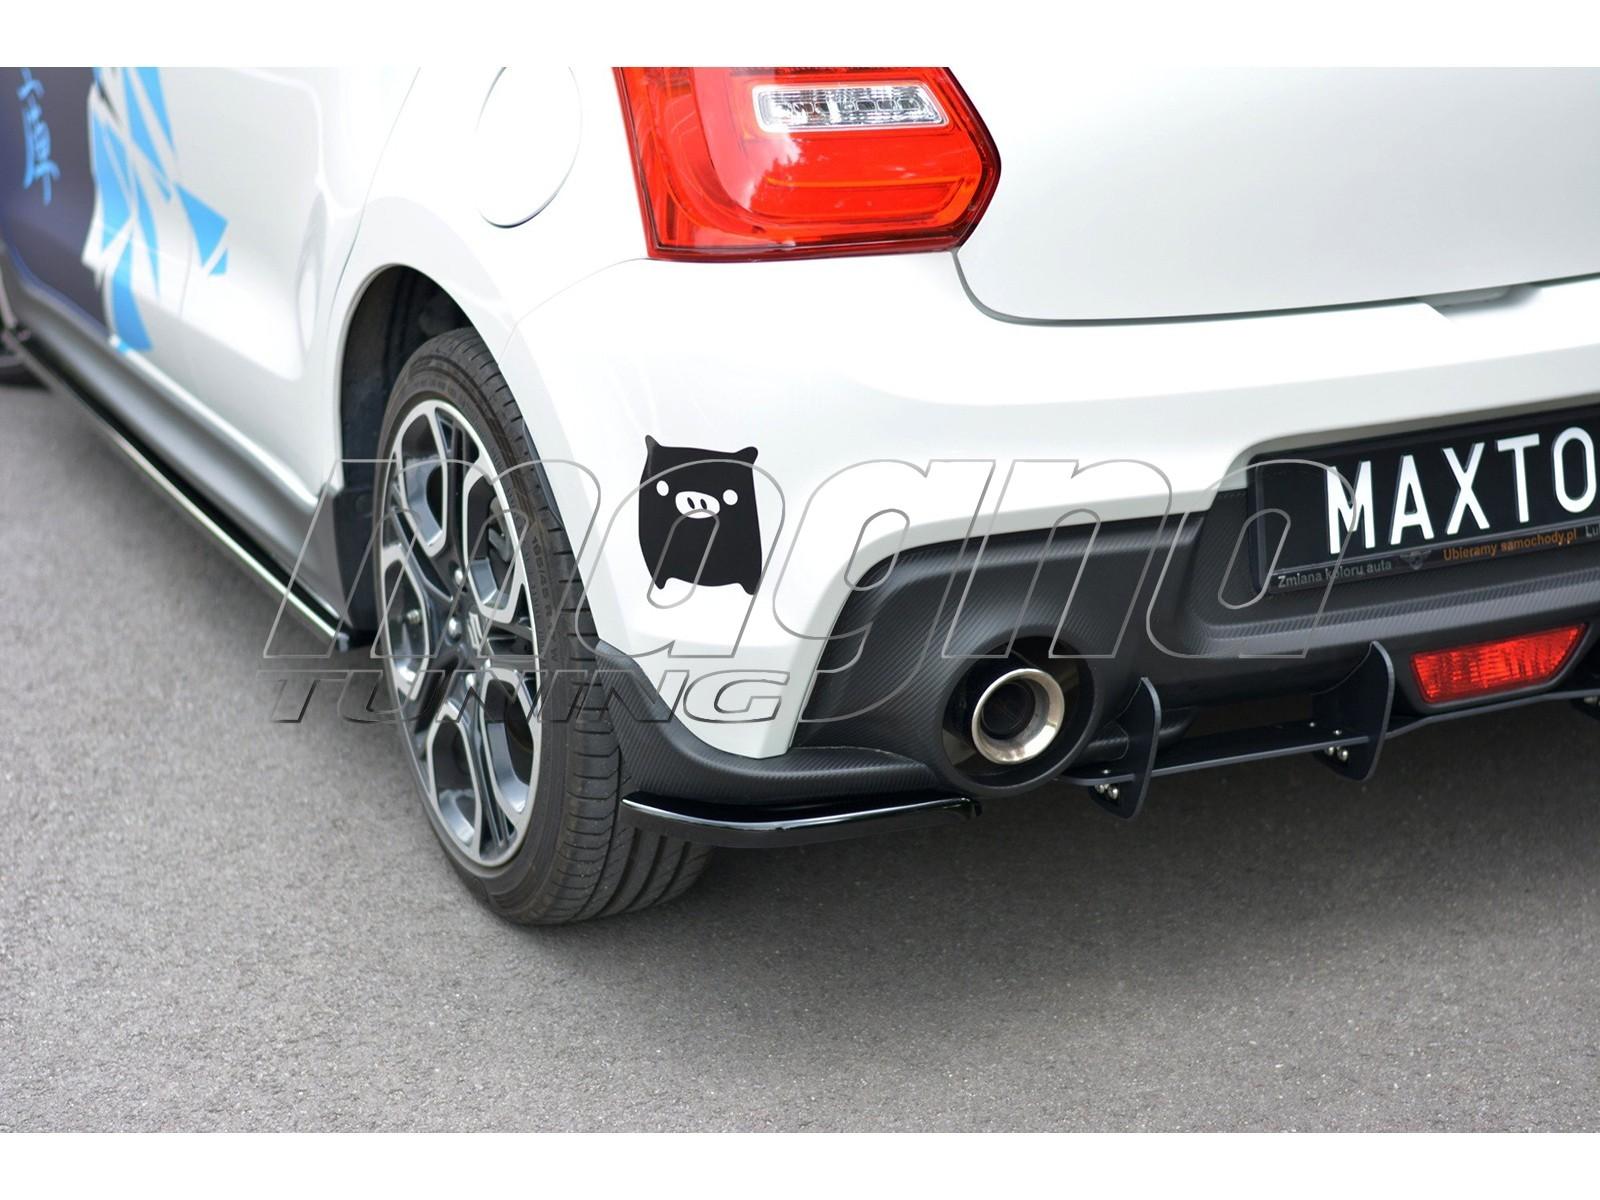 Suzuki Swift Sport MK4 MX Body Kit